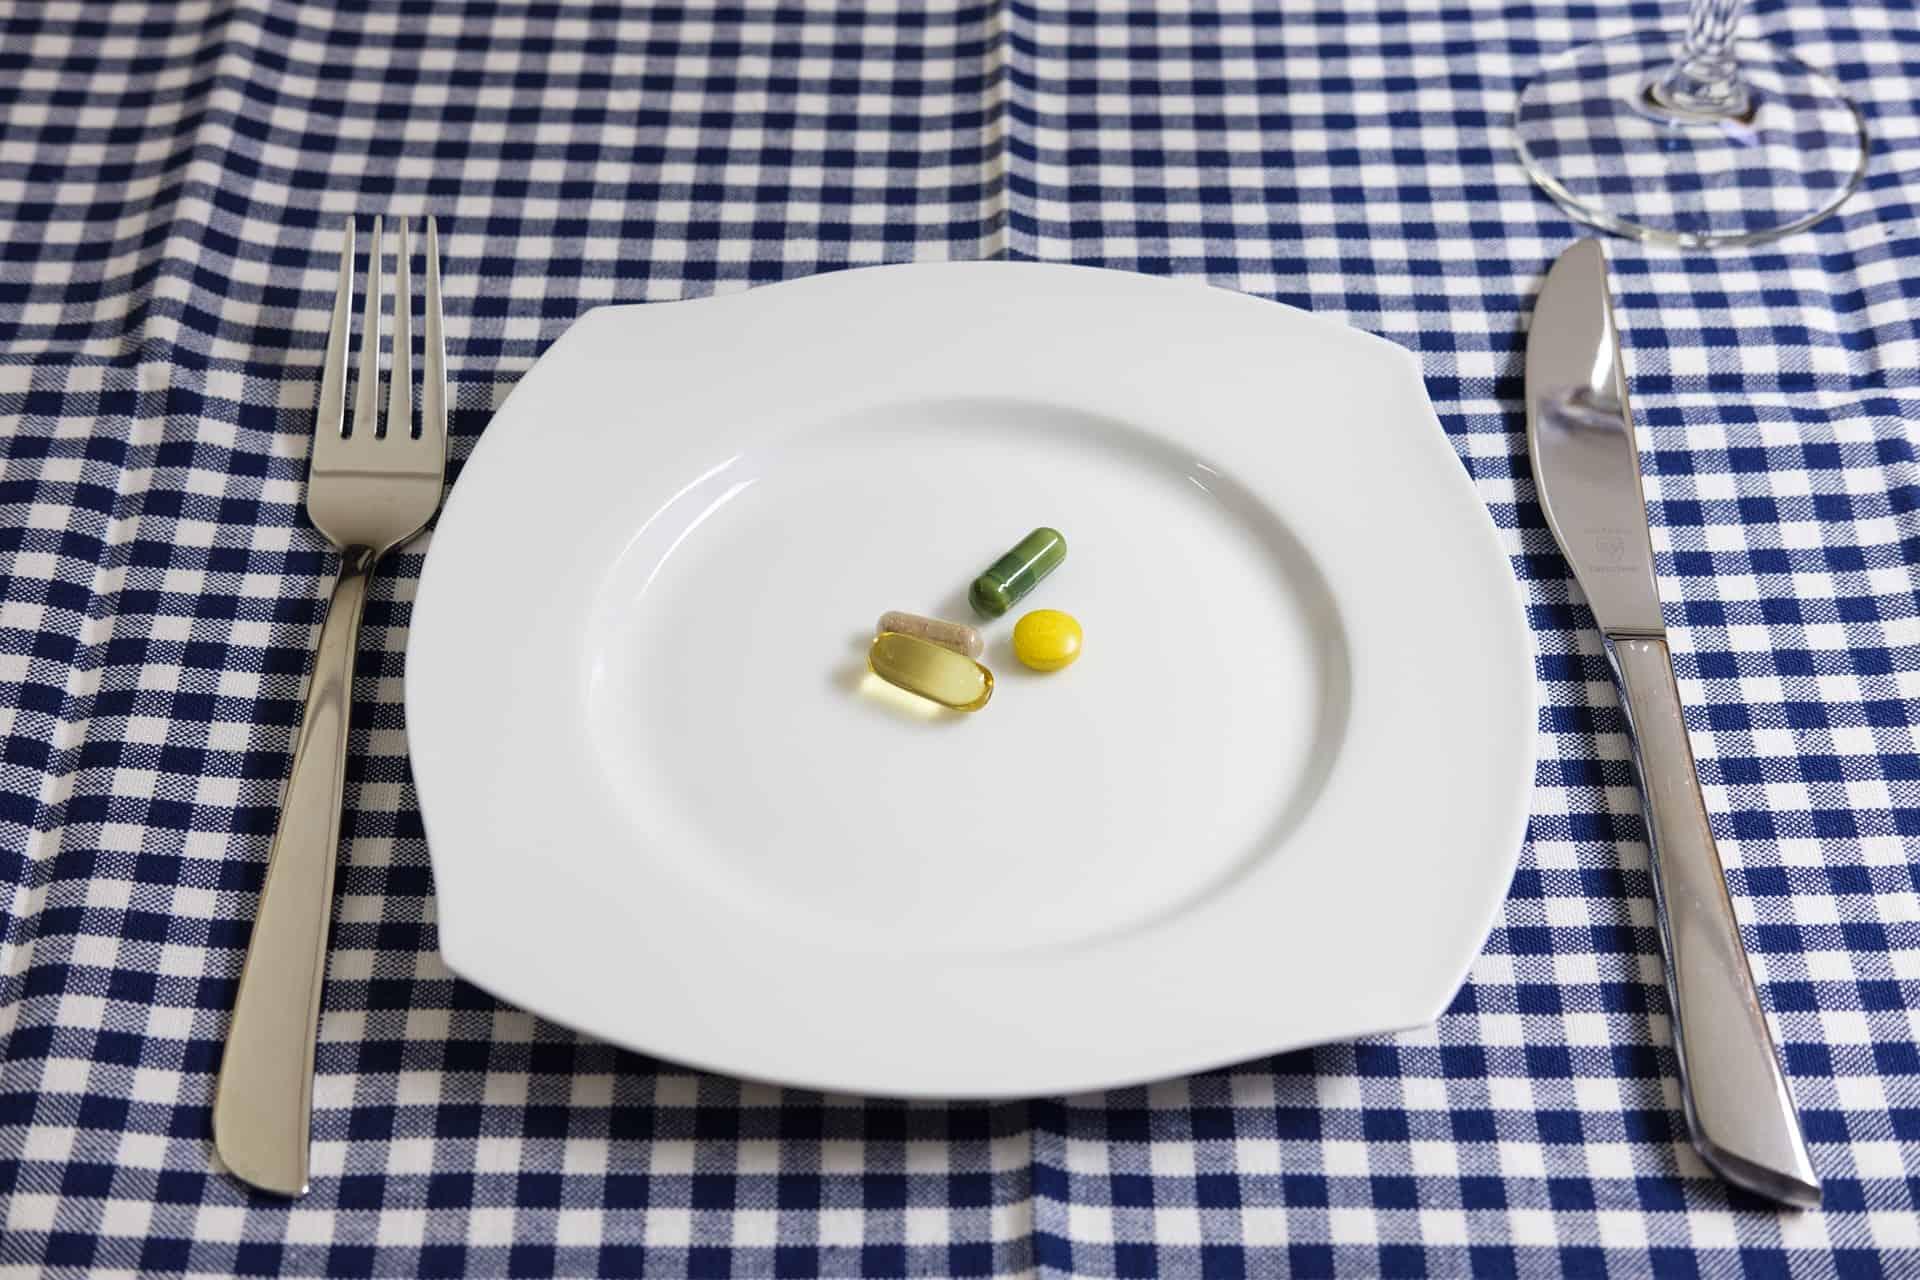 Flourish Probiotic Ingredients